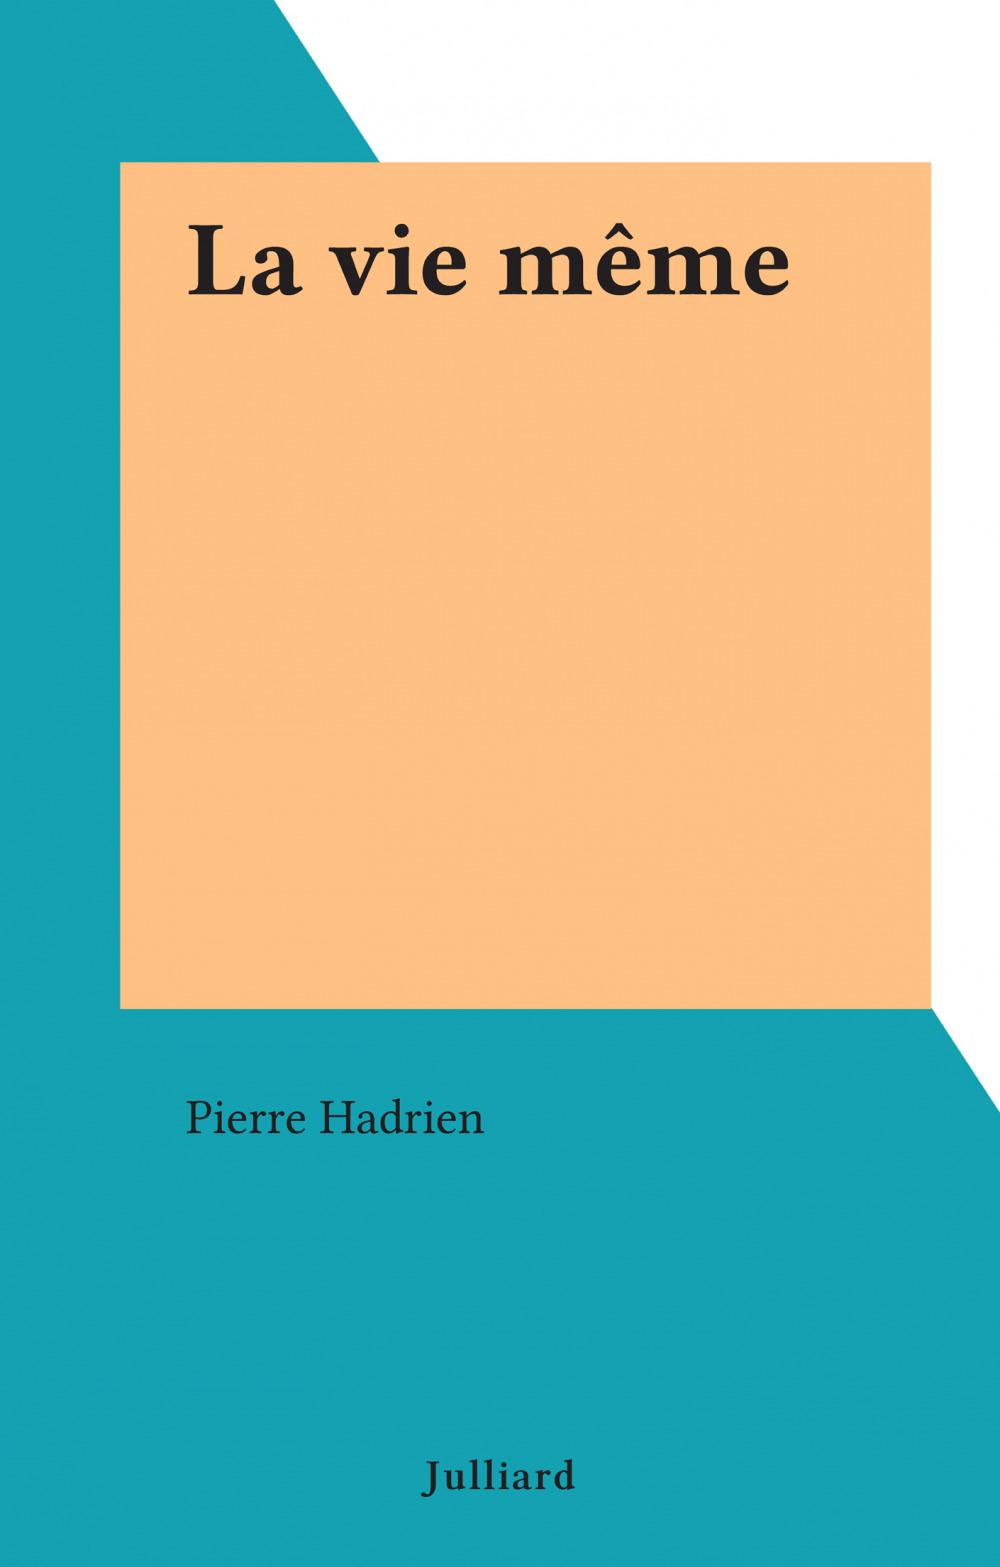 La vie même  - Pierre Hadrien